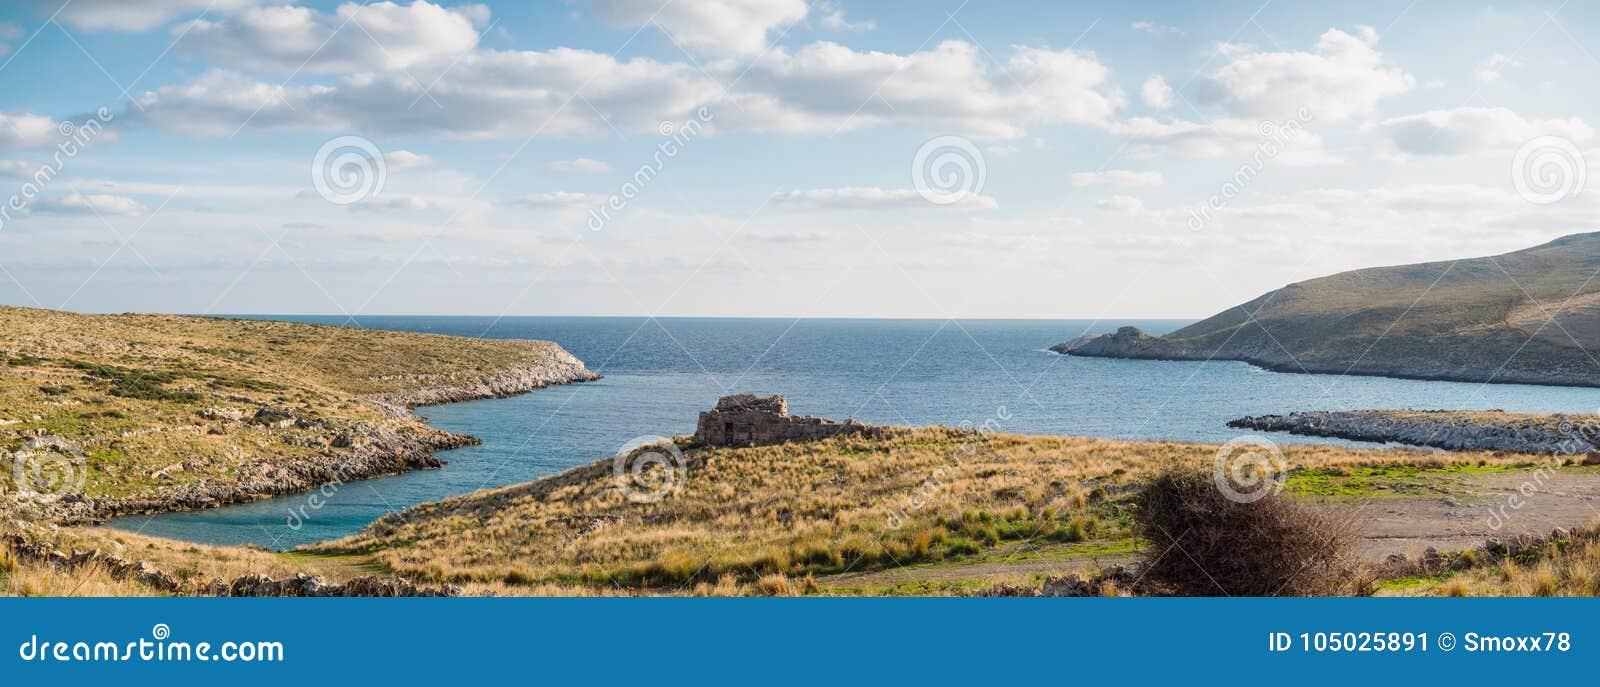 Cape Matapan in Mani, Laconia, Peloponnese, Greece